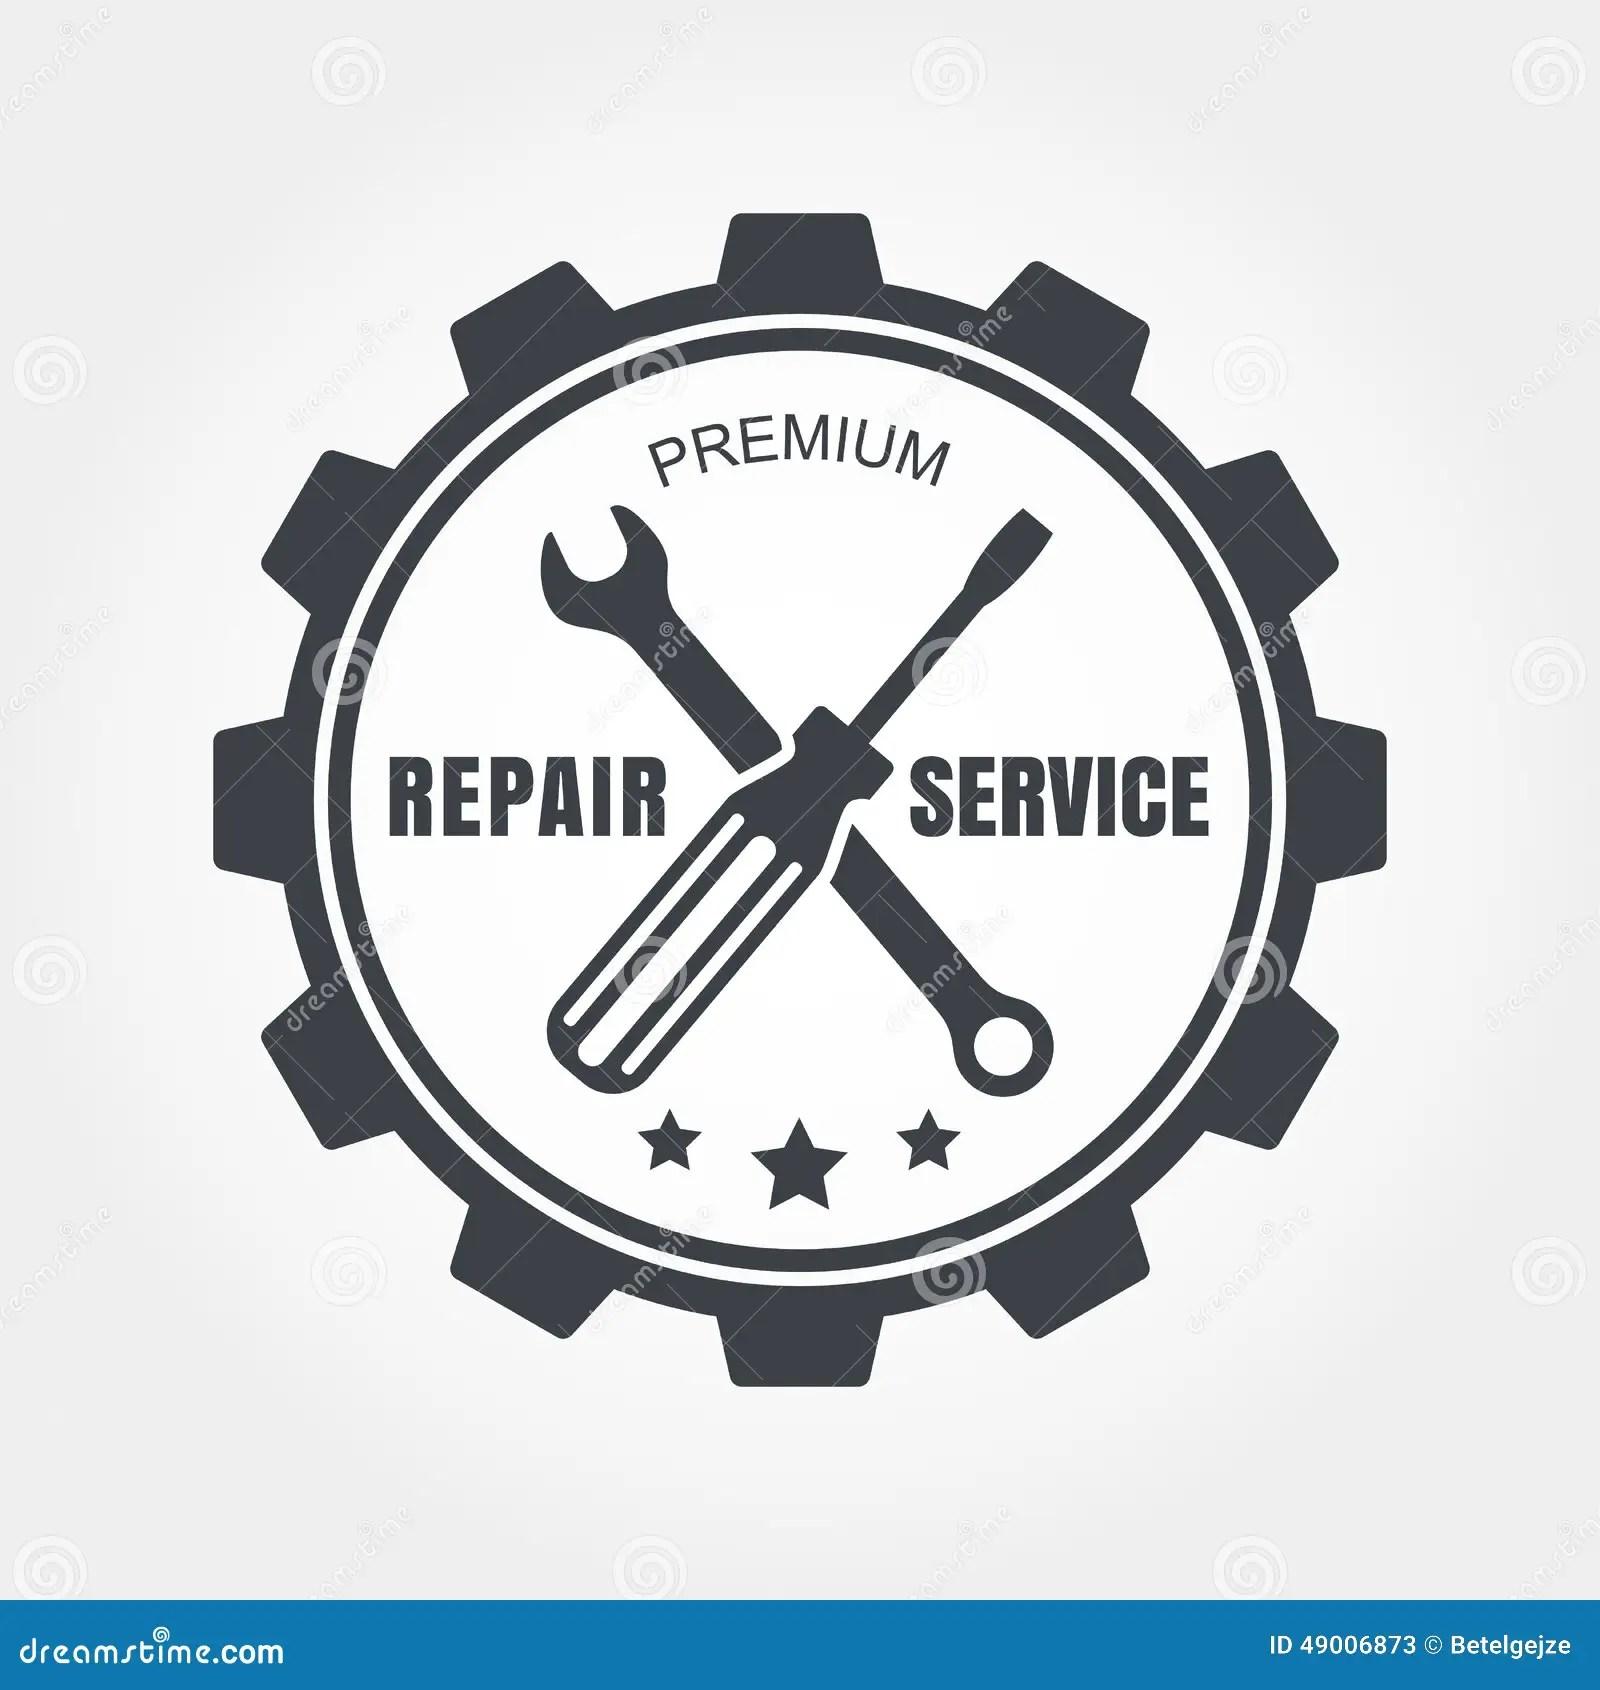 Vintage Style Car Repair Service Label. Vector Logo Design